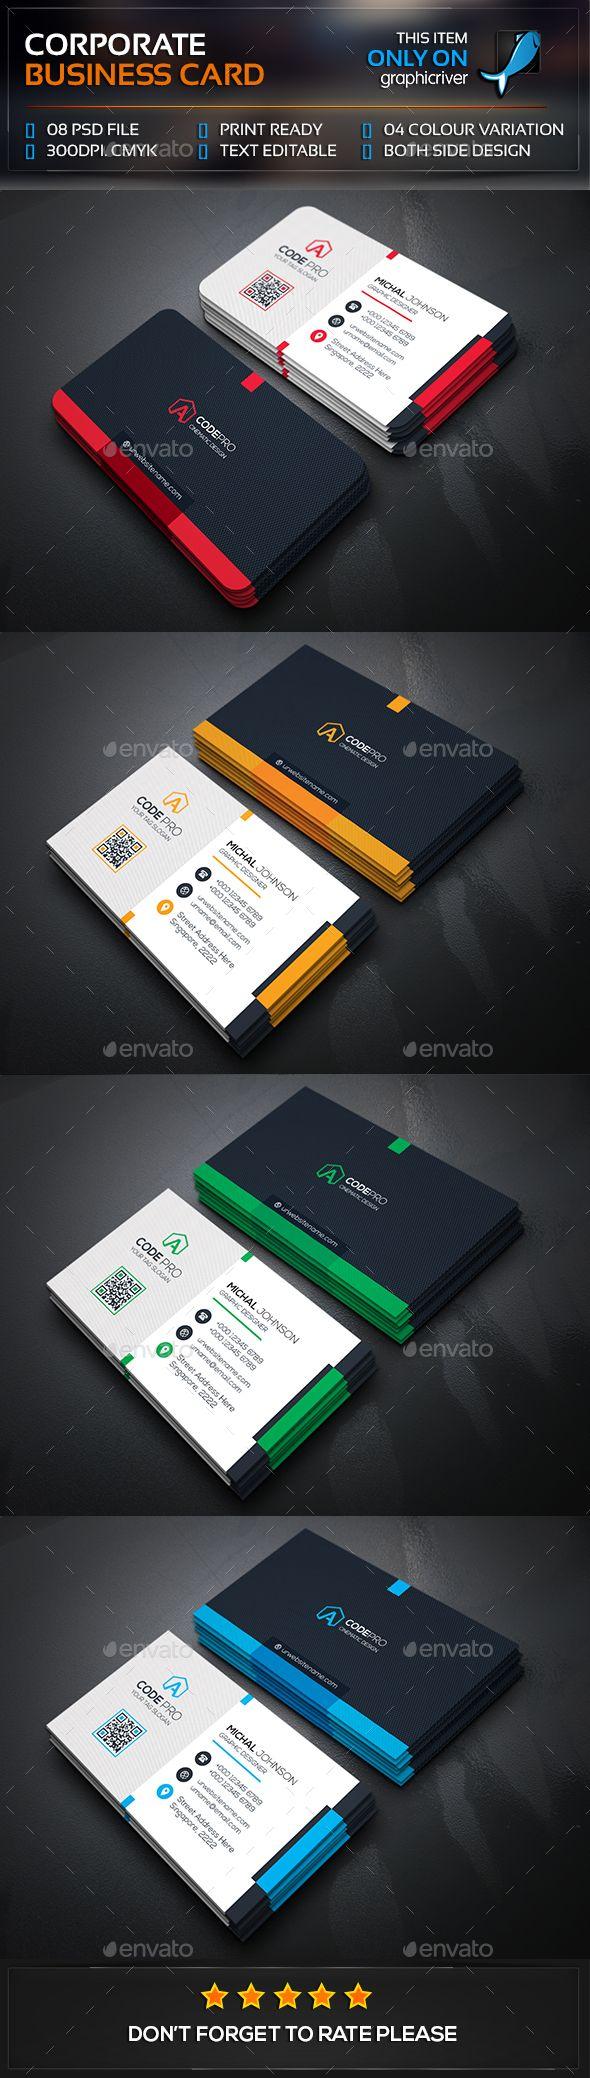 mega corporate business card template psd visitcard design